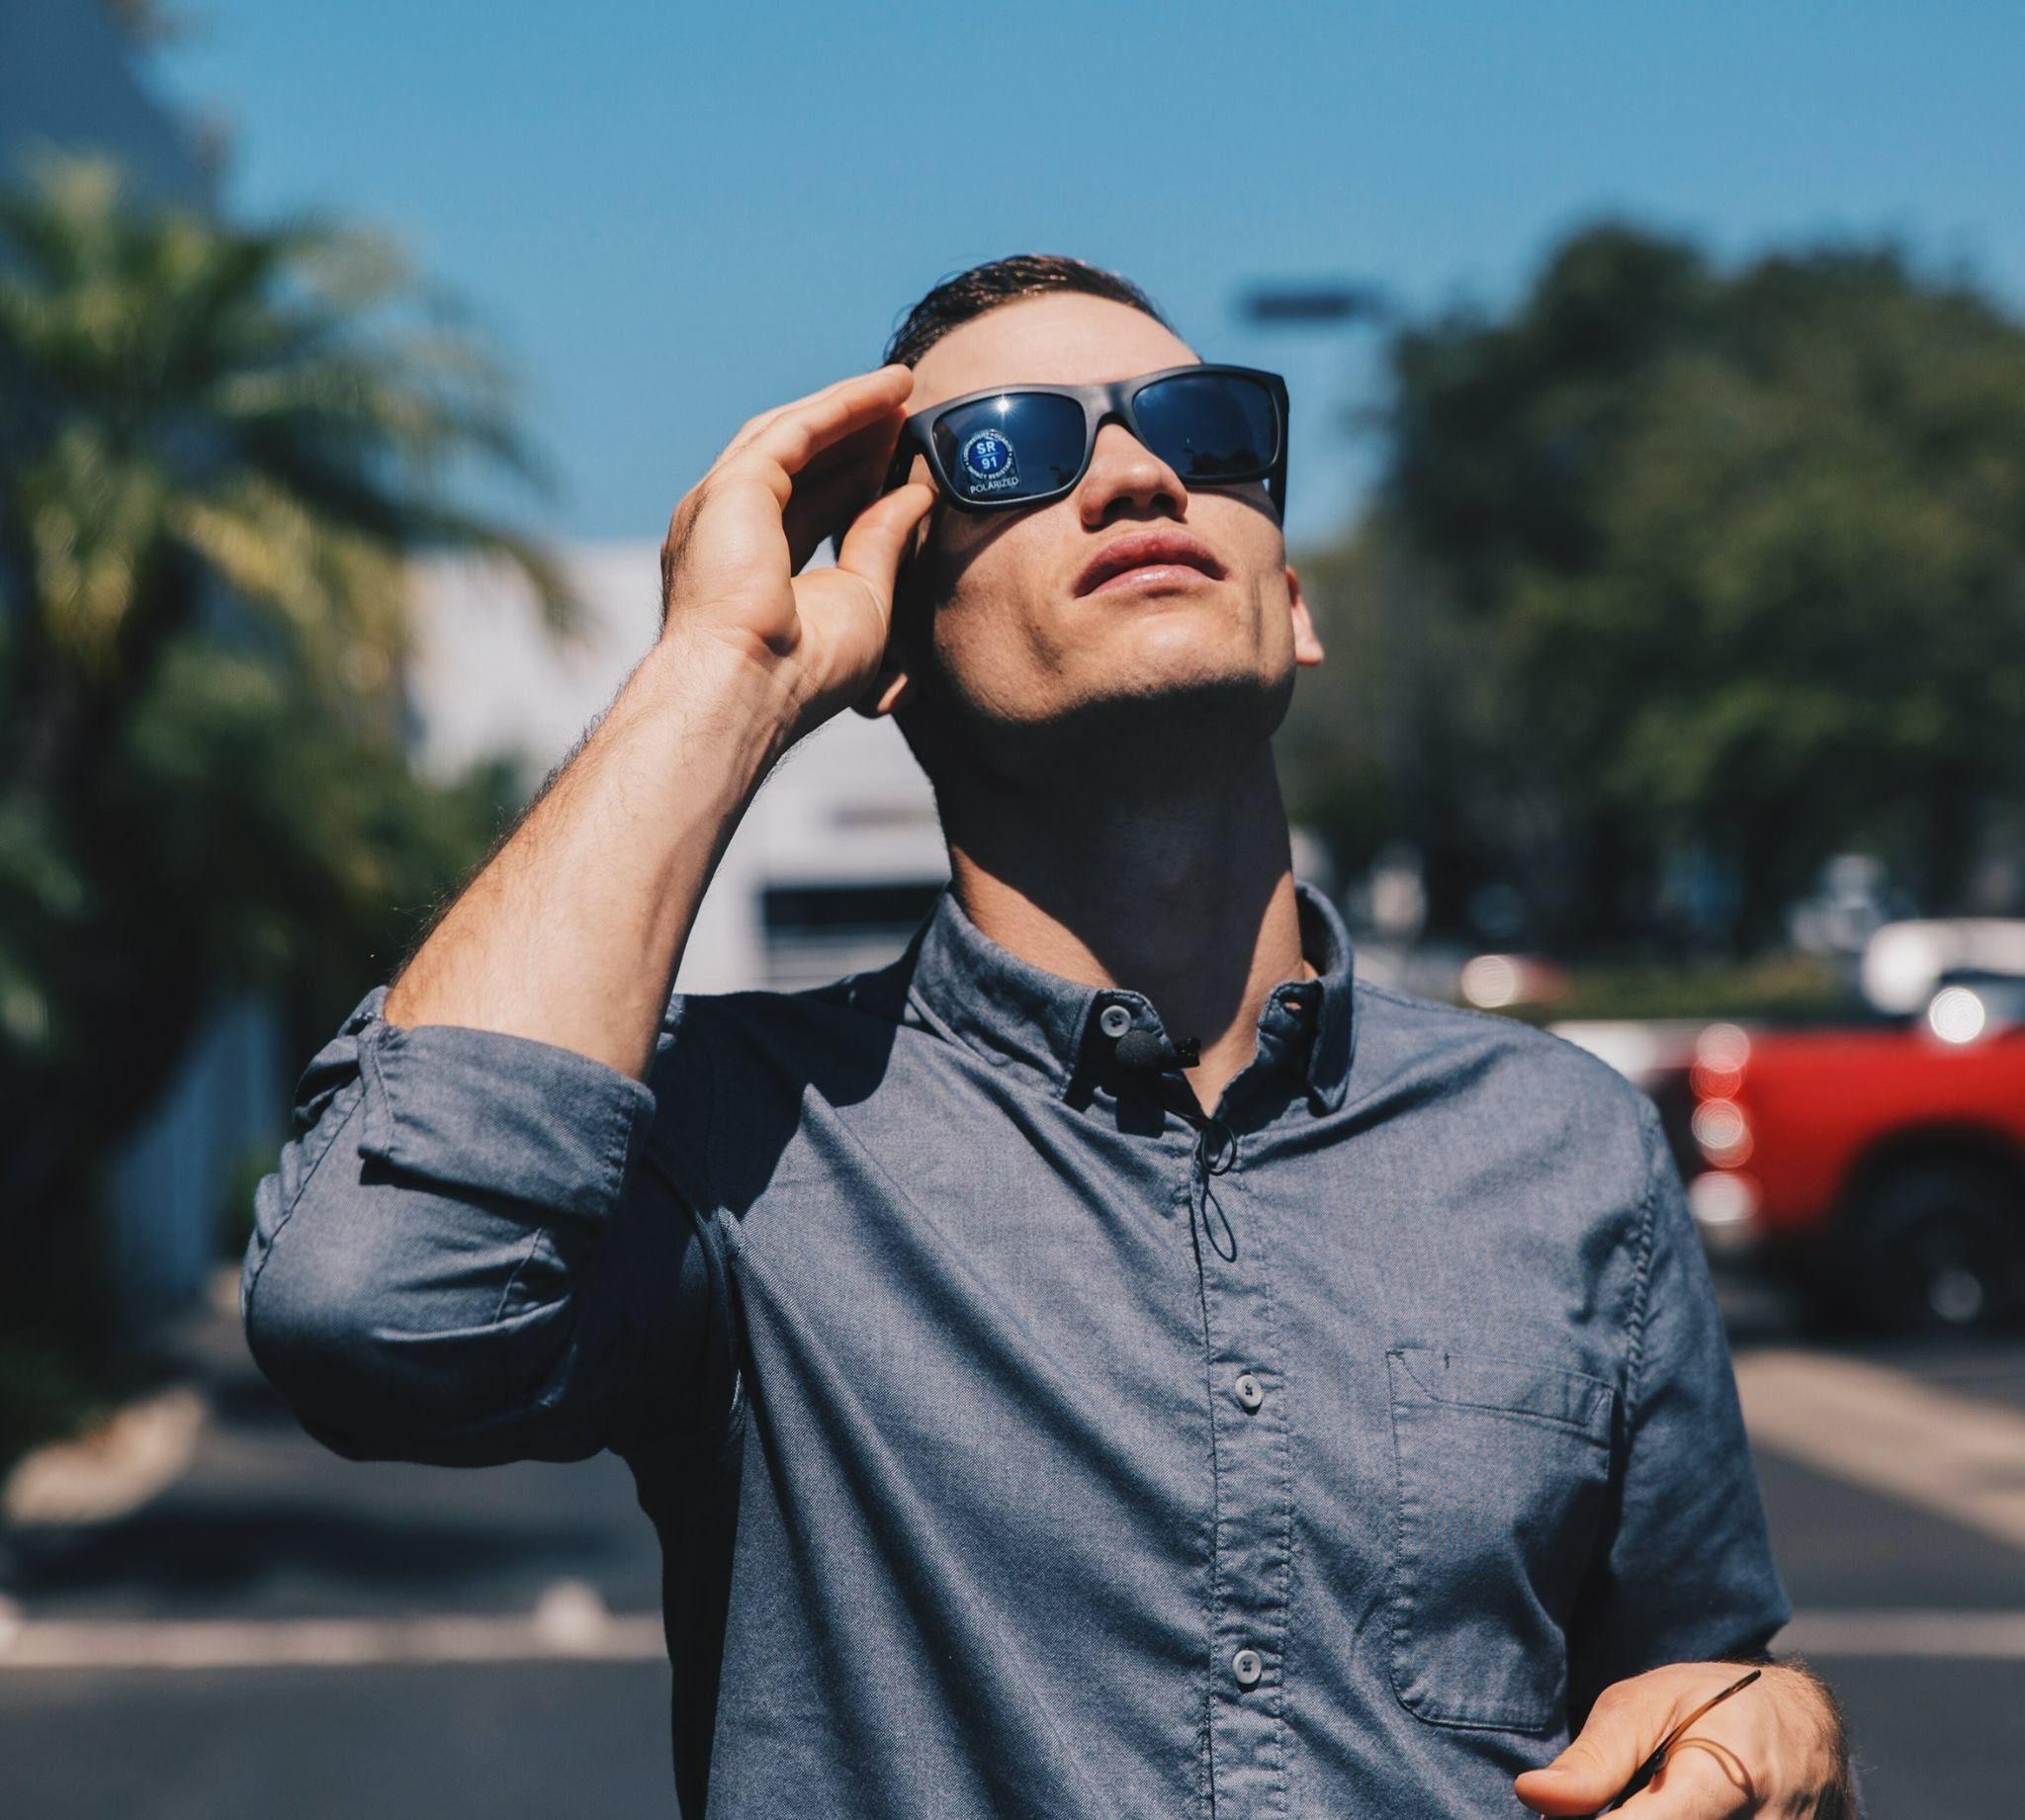 Mlb Player Kelby Tomlinson Of The San Fransisco Giants Wears Nike Fleet Rx Sunglasses Free Sunglasses Prescription Sunglasses